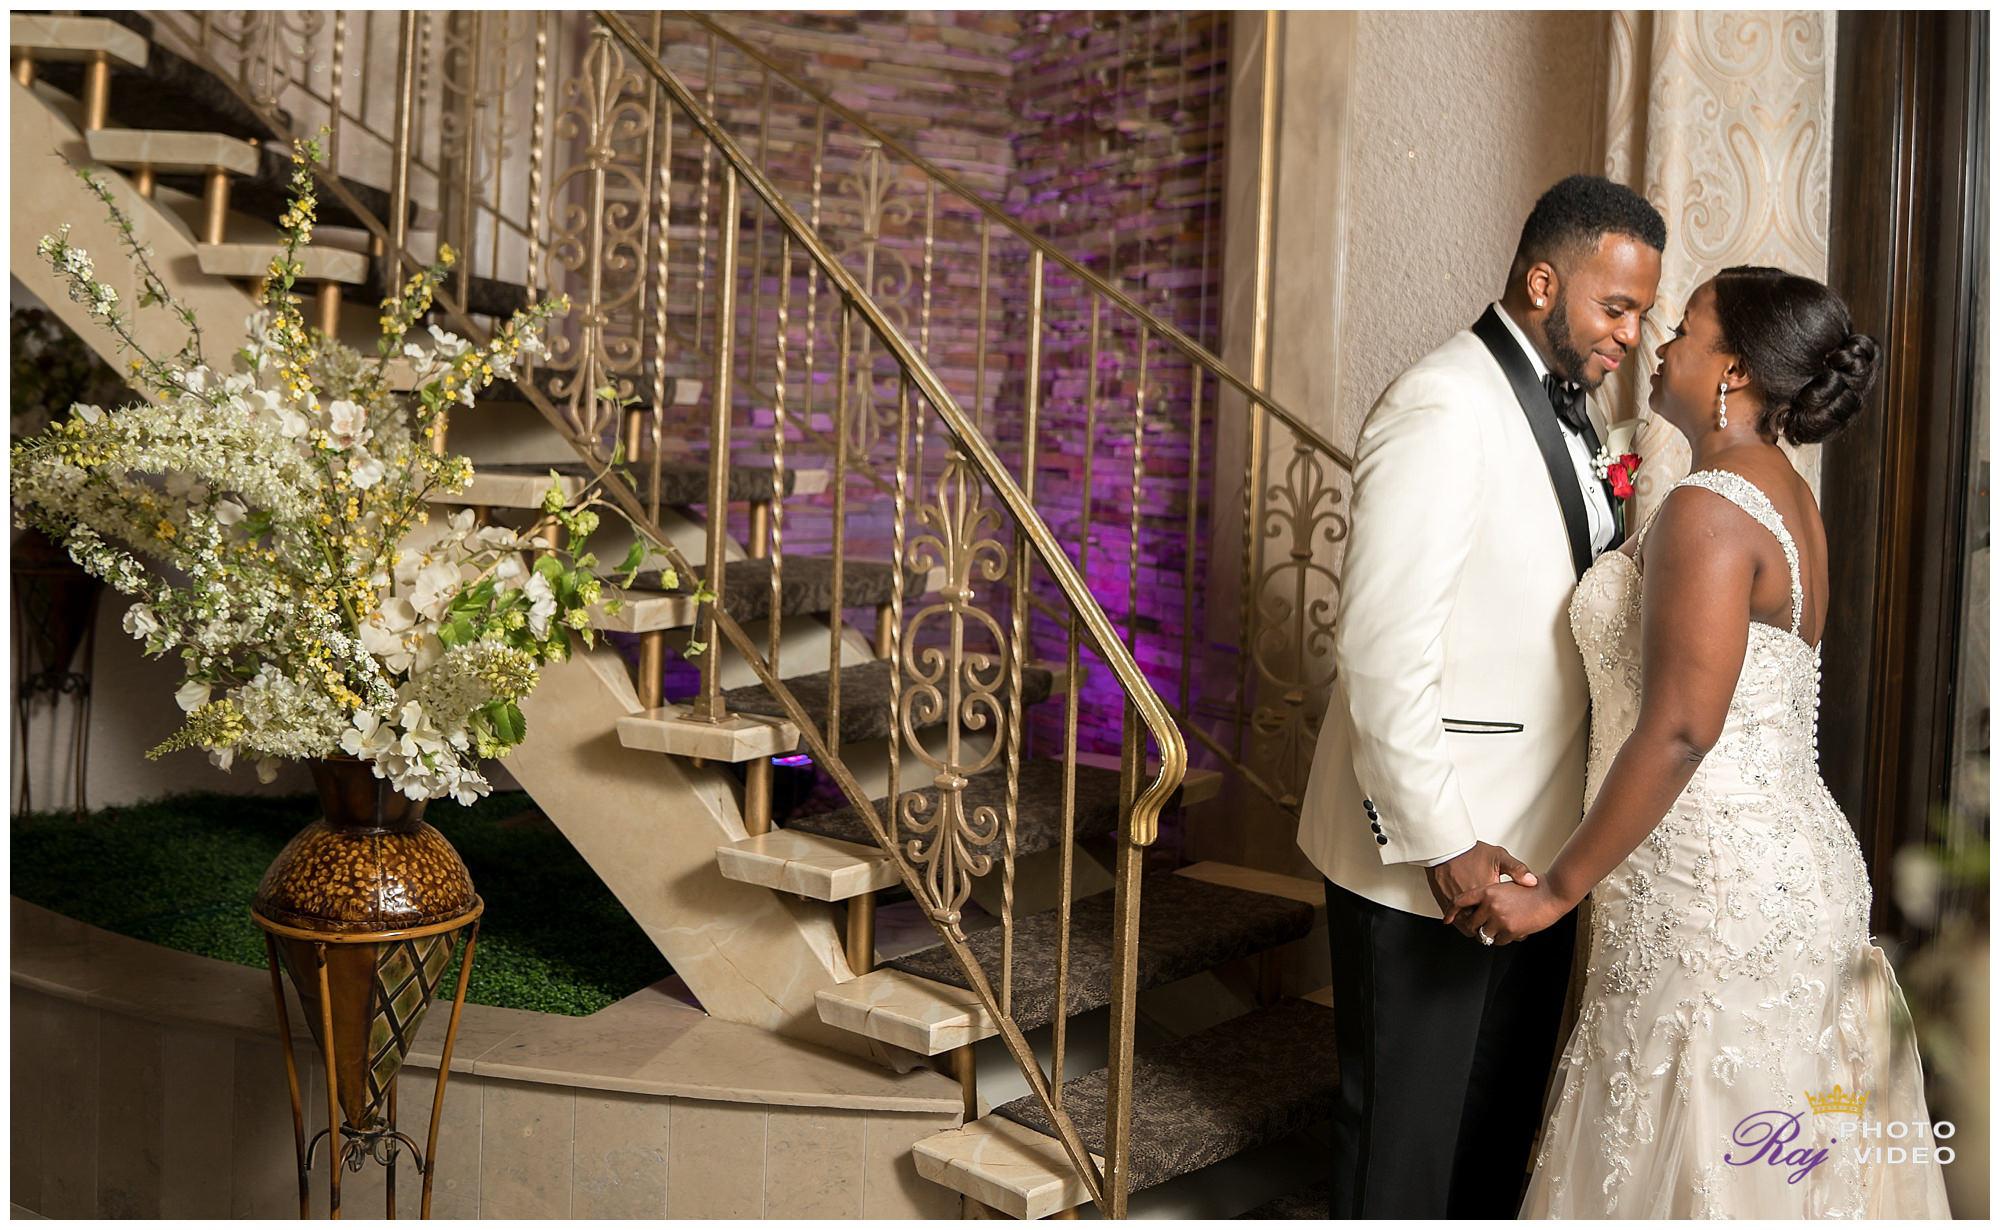 Royal_Manor_Garfield_NJ_Christian_Wedding_Jade_Scott-0029.jpg